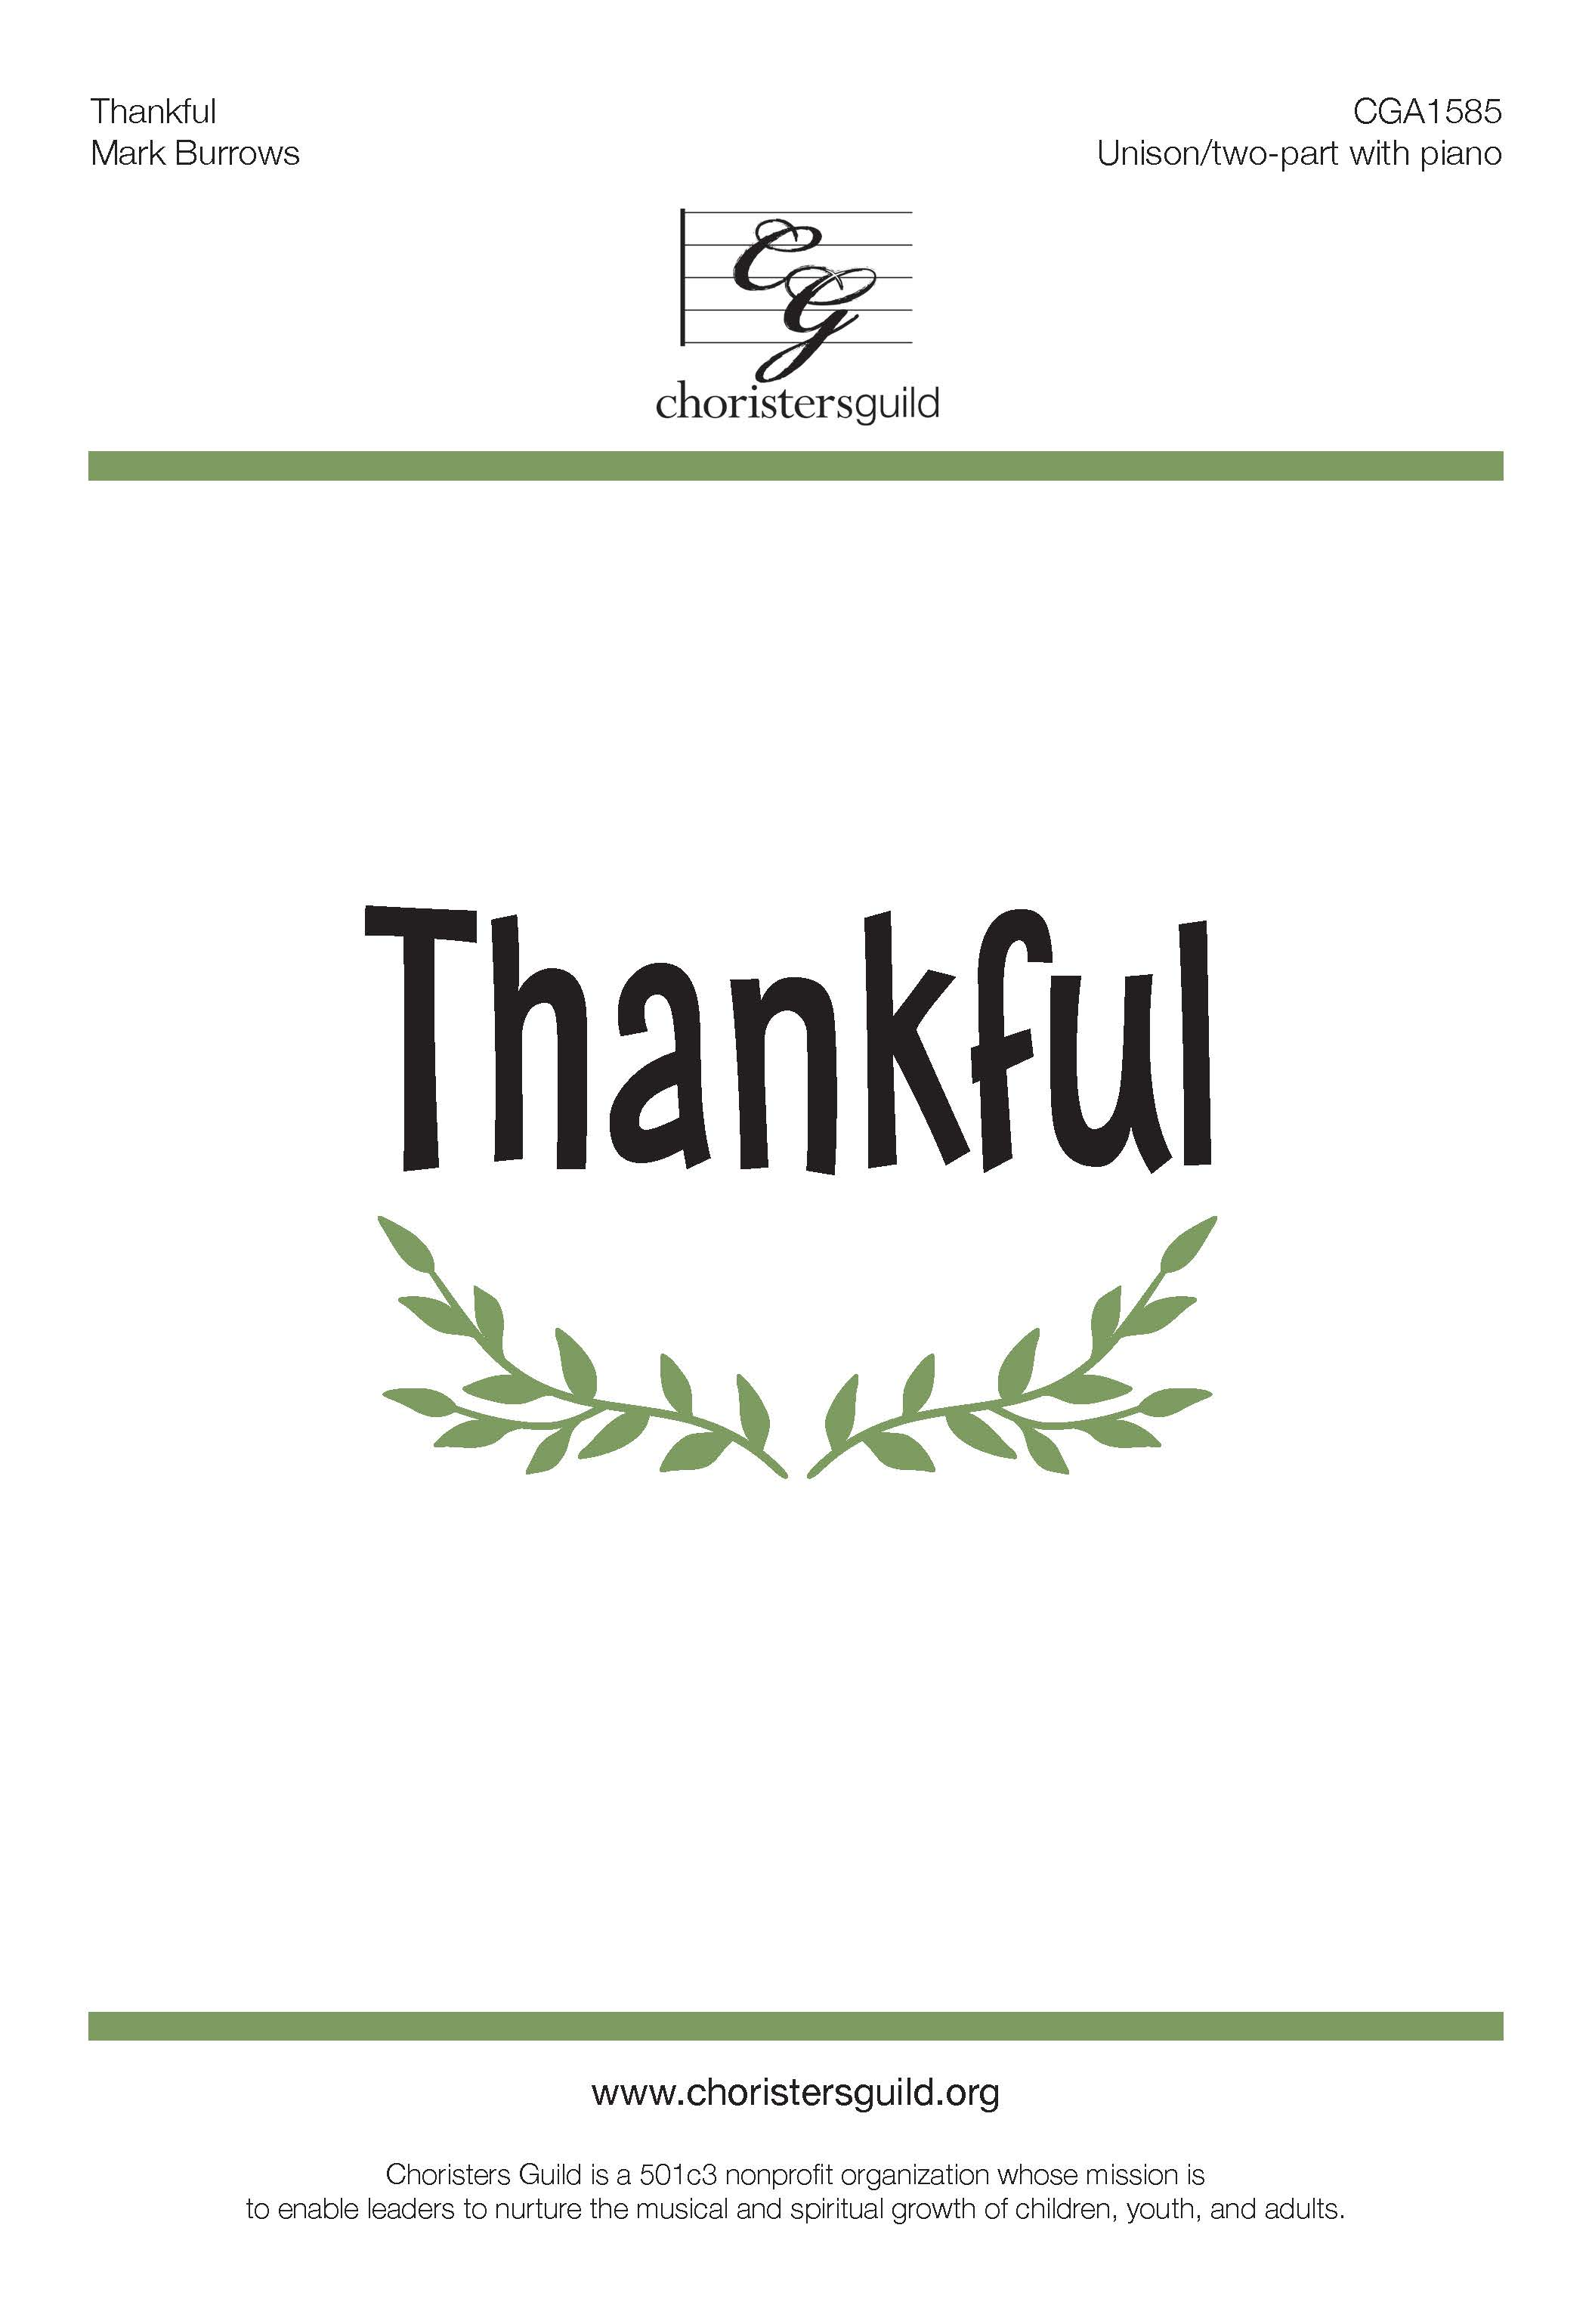 Thankful - Unison/Two-part